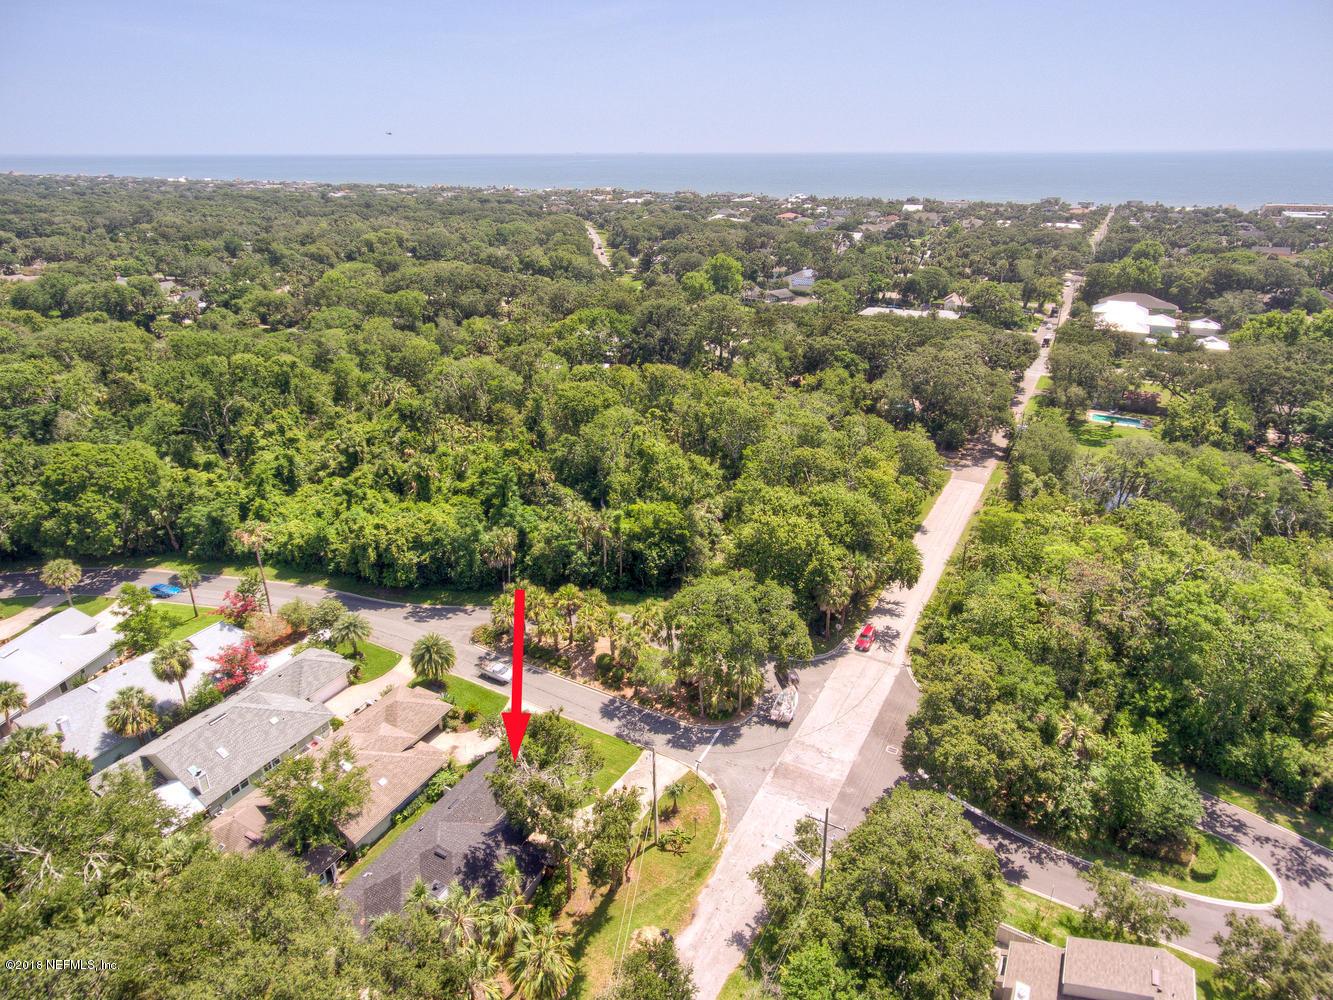 1100 LINKSIDE, ATLANTIC BEACH, FLORIDA 32233, 3 Bedrooms Bedrooms, ,2 BathroomsBathrooms,Residential - single family,For sale,LINKSIDE,943181